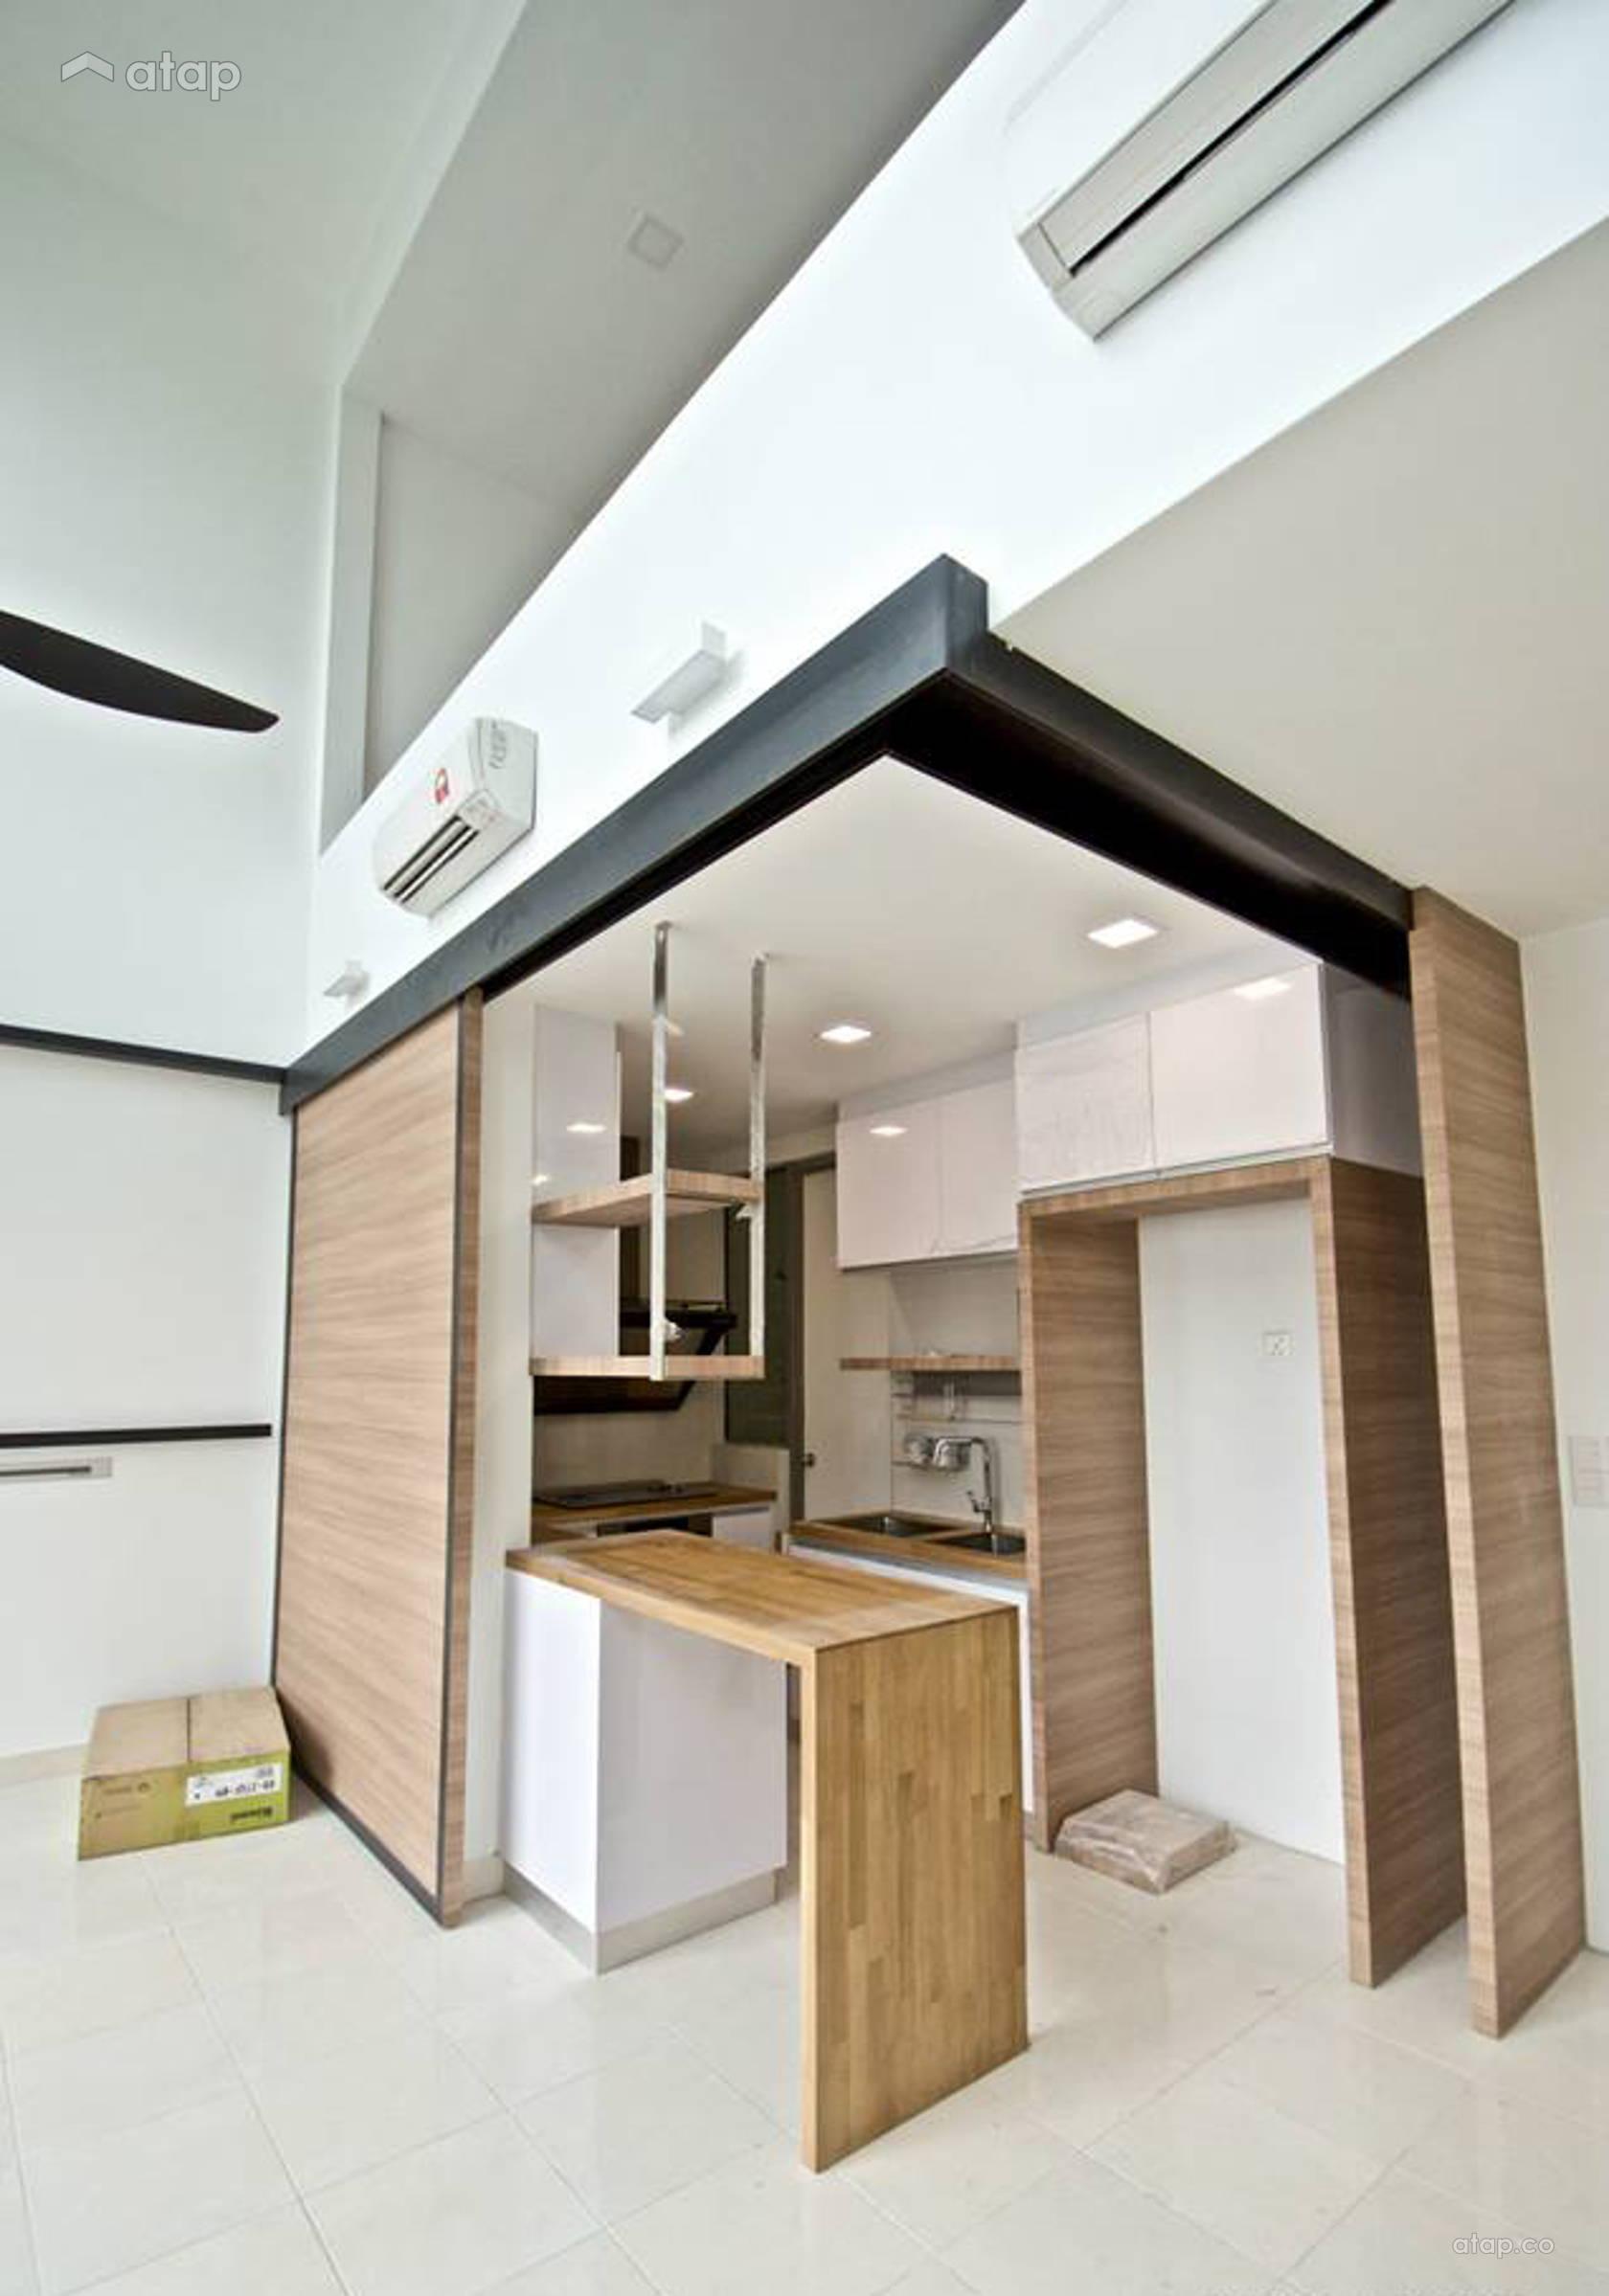 Modern Zen Kitchen others design ideas & photos Malaysia ... on zen modern home interior, mid century modern kitchen, zen style home interior,